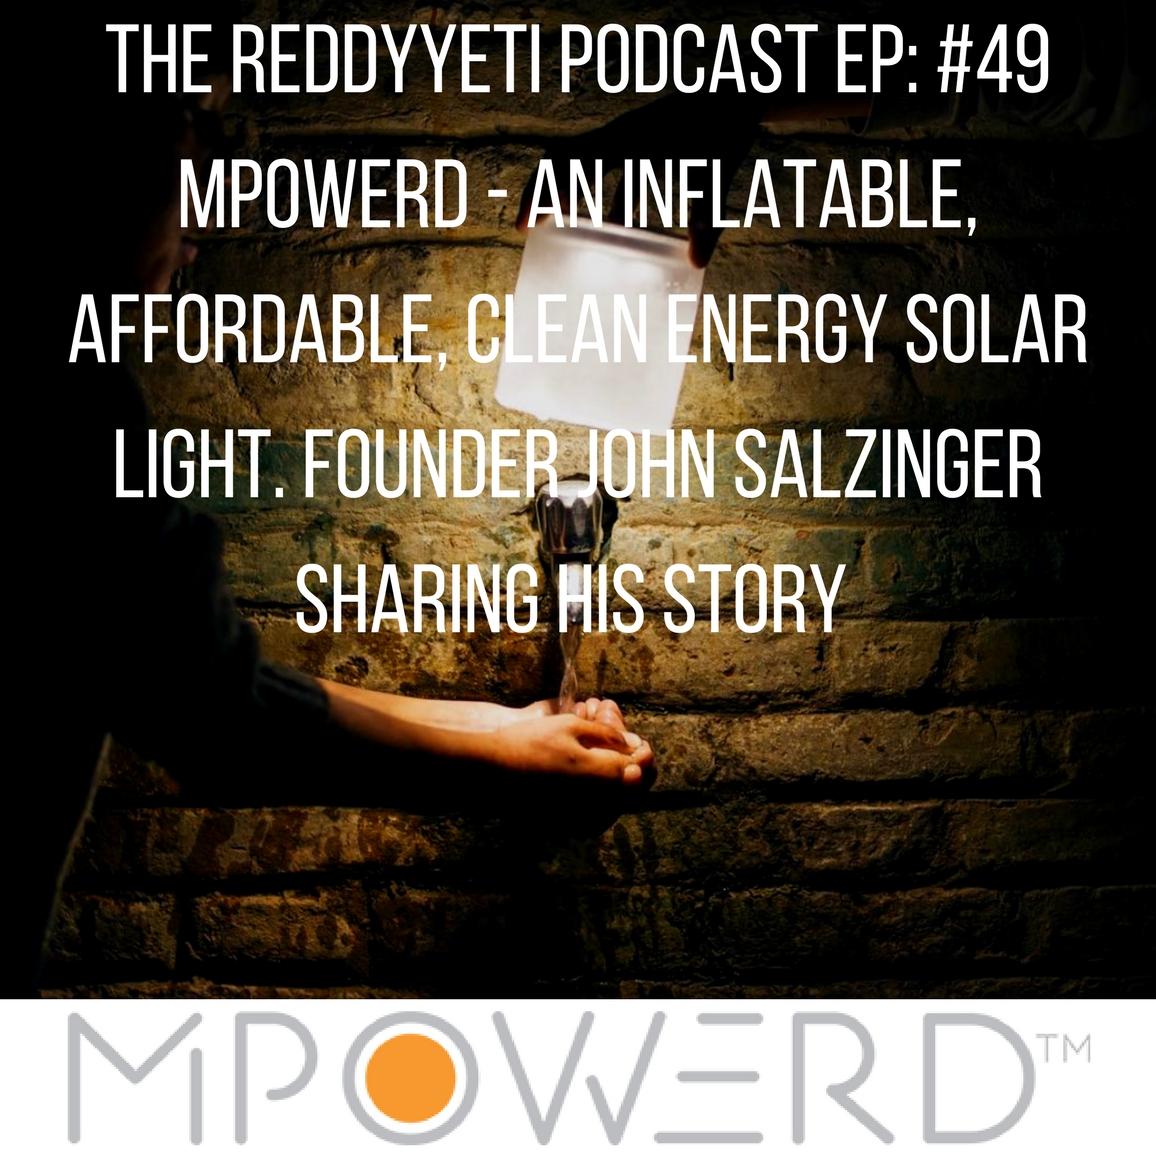 Mpowerd Podcast image.jpg